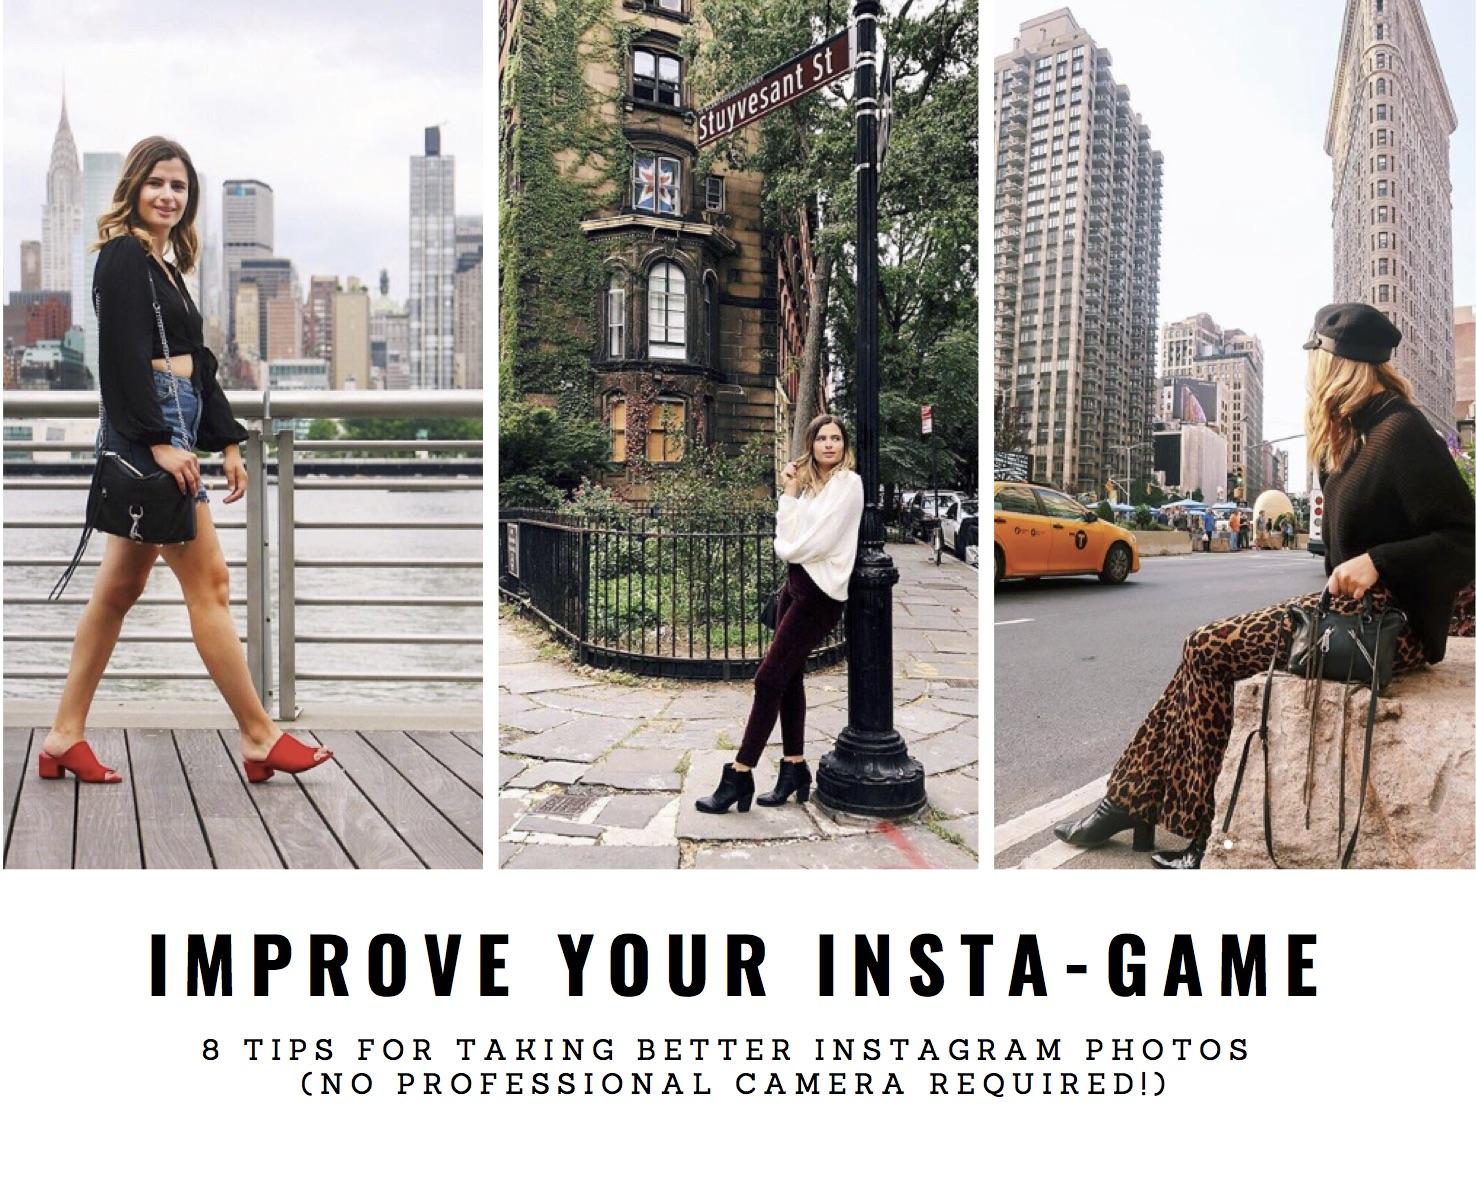 improve your insta-game.jpg